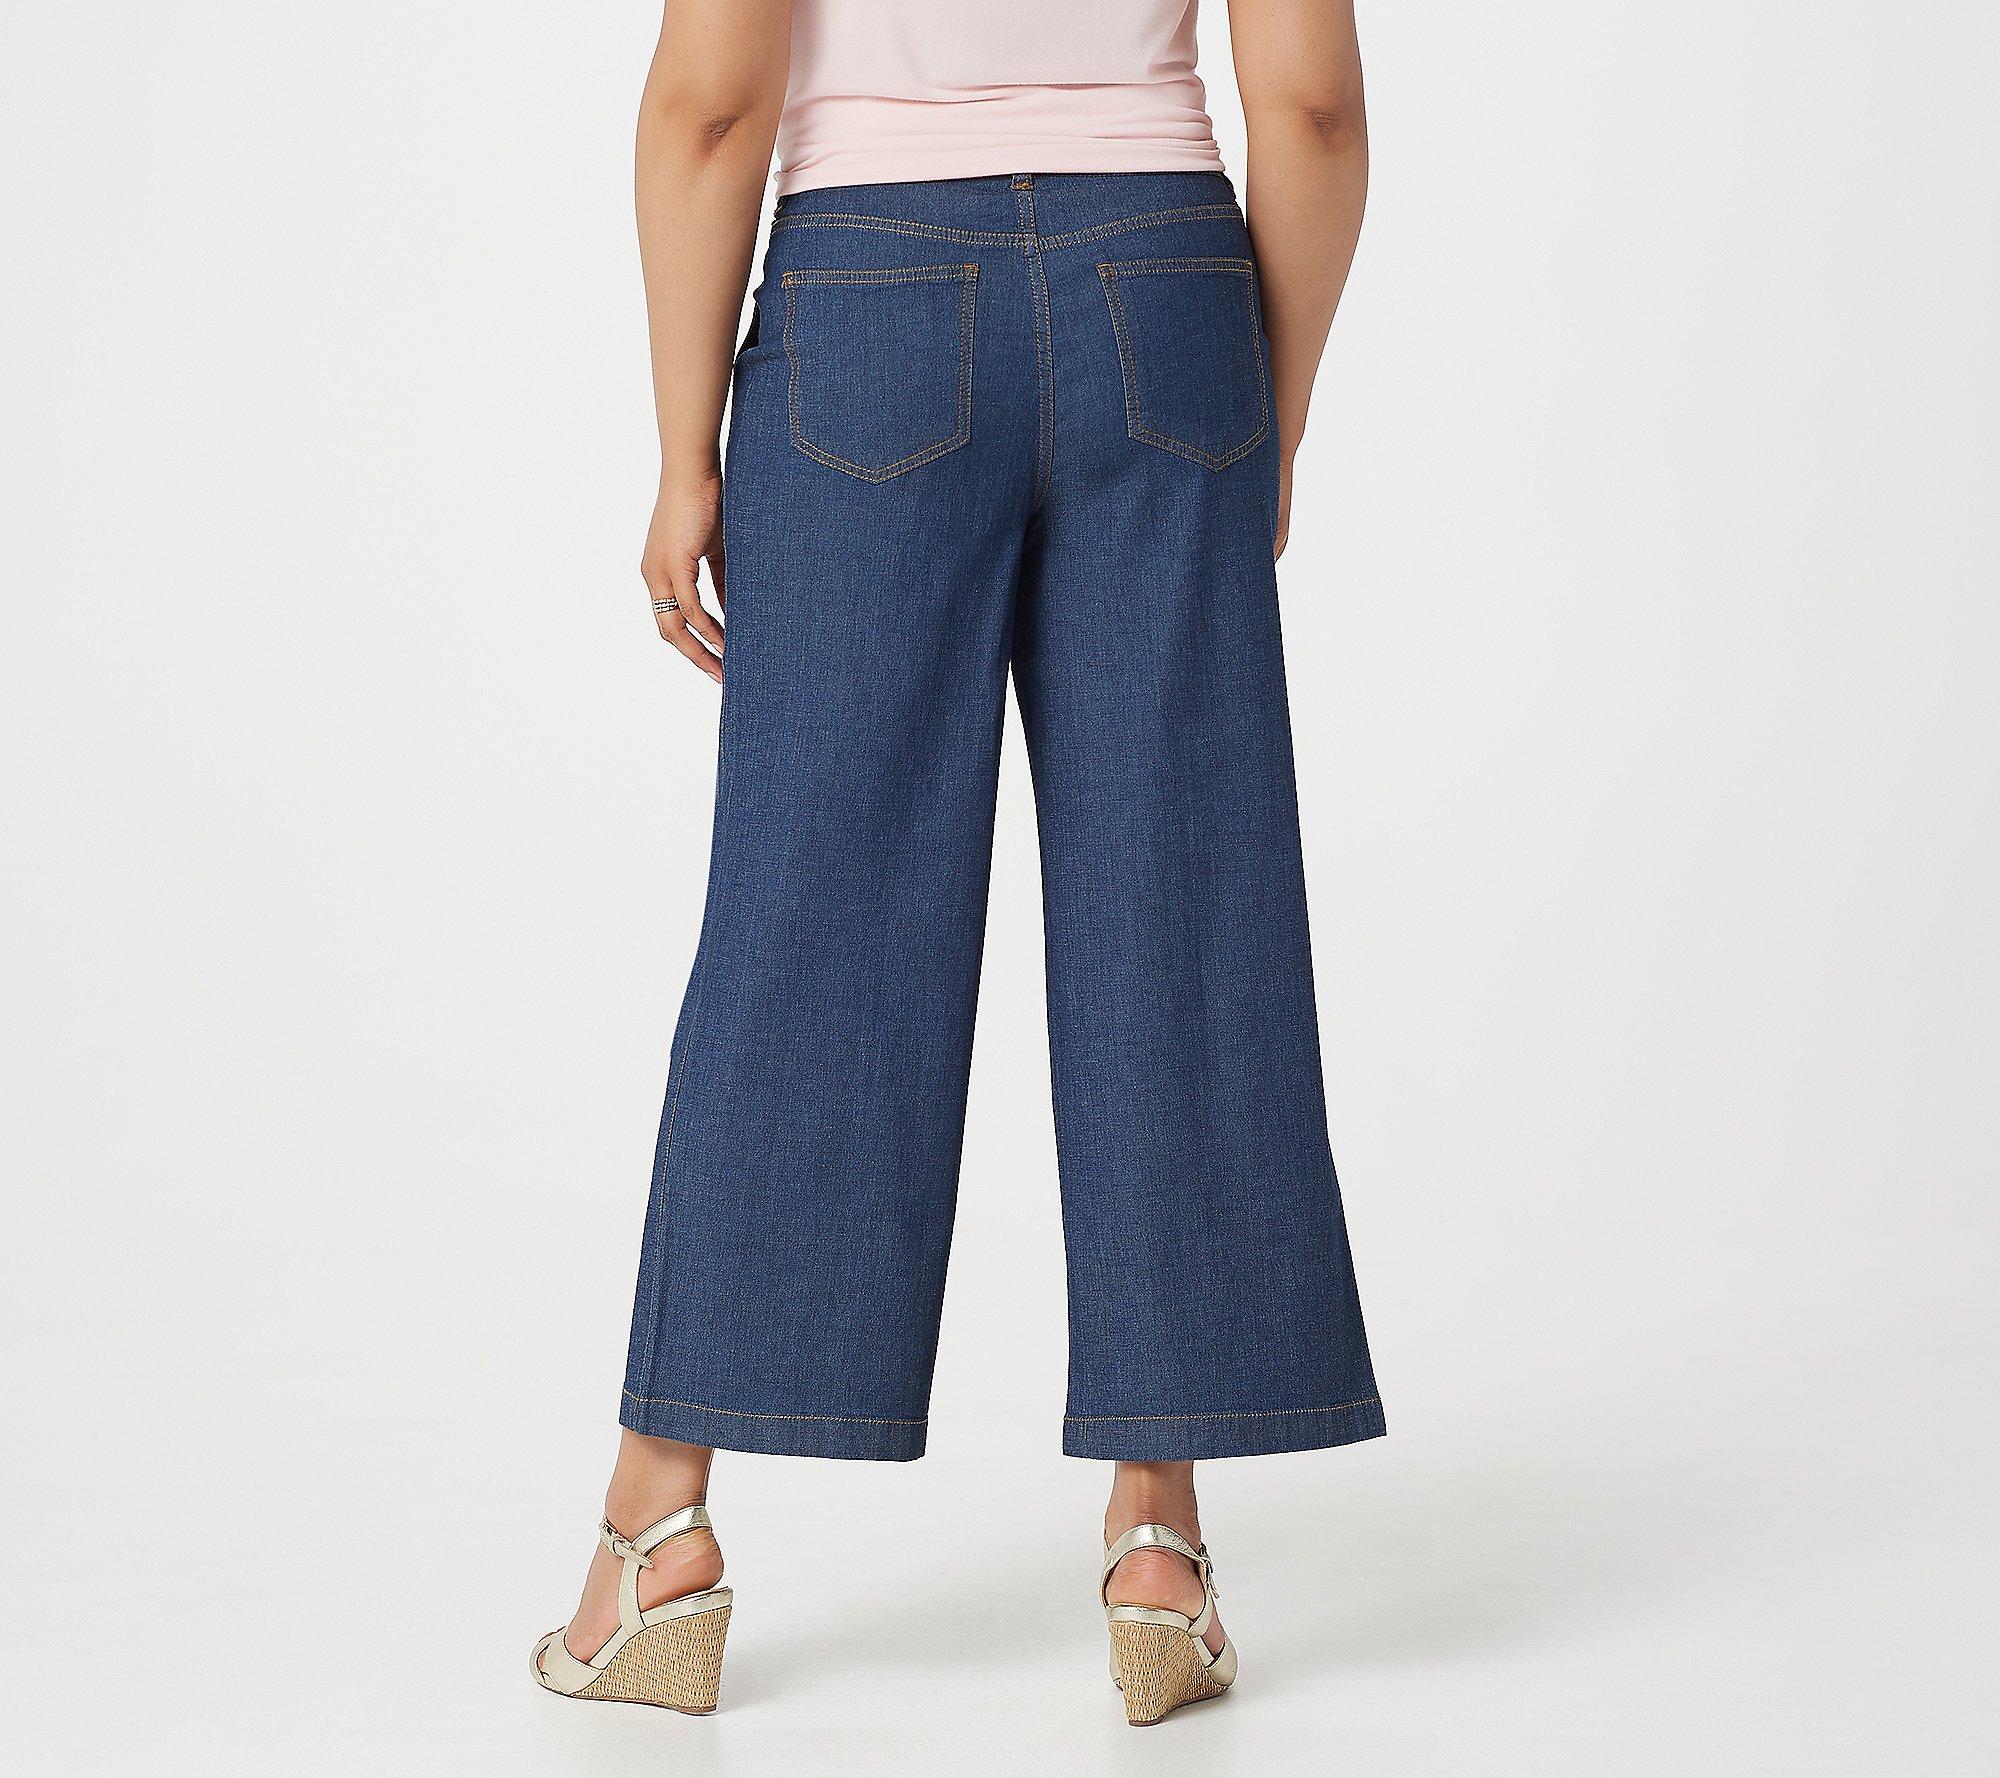 Women/'s Beach Petite Pull-On Wide Leg Knit Pants Black PS Size QVC Denim /& Co